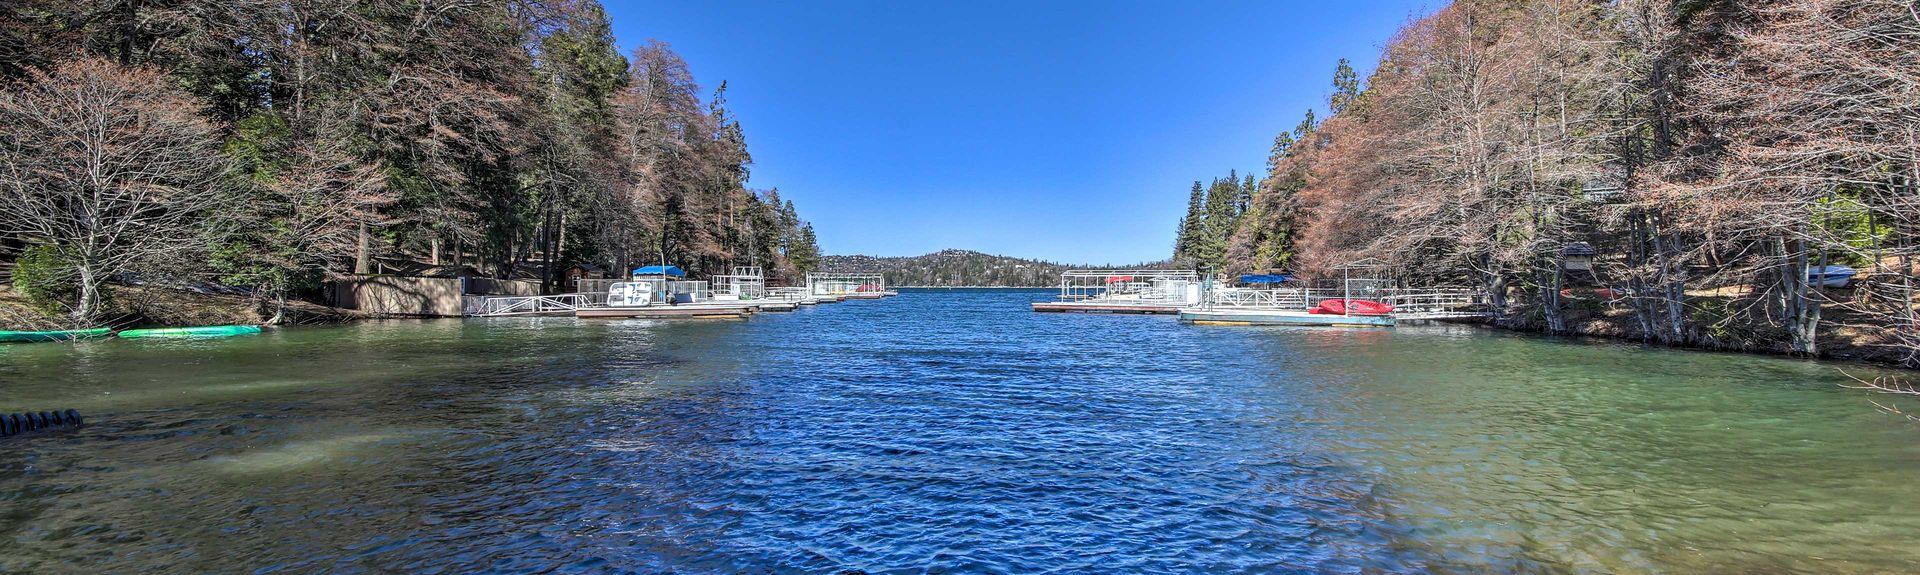 Blue Jay, Lake Arrowhead, California, United States of America